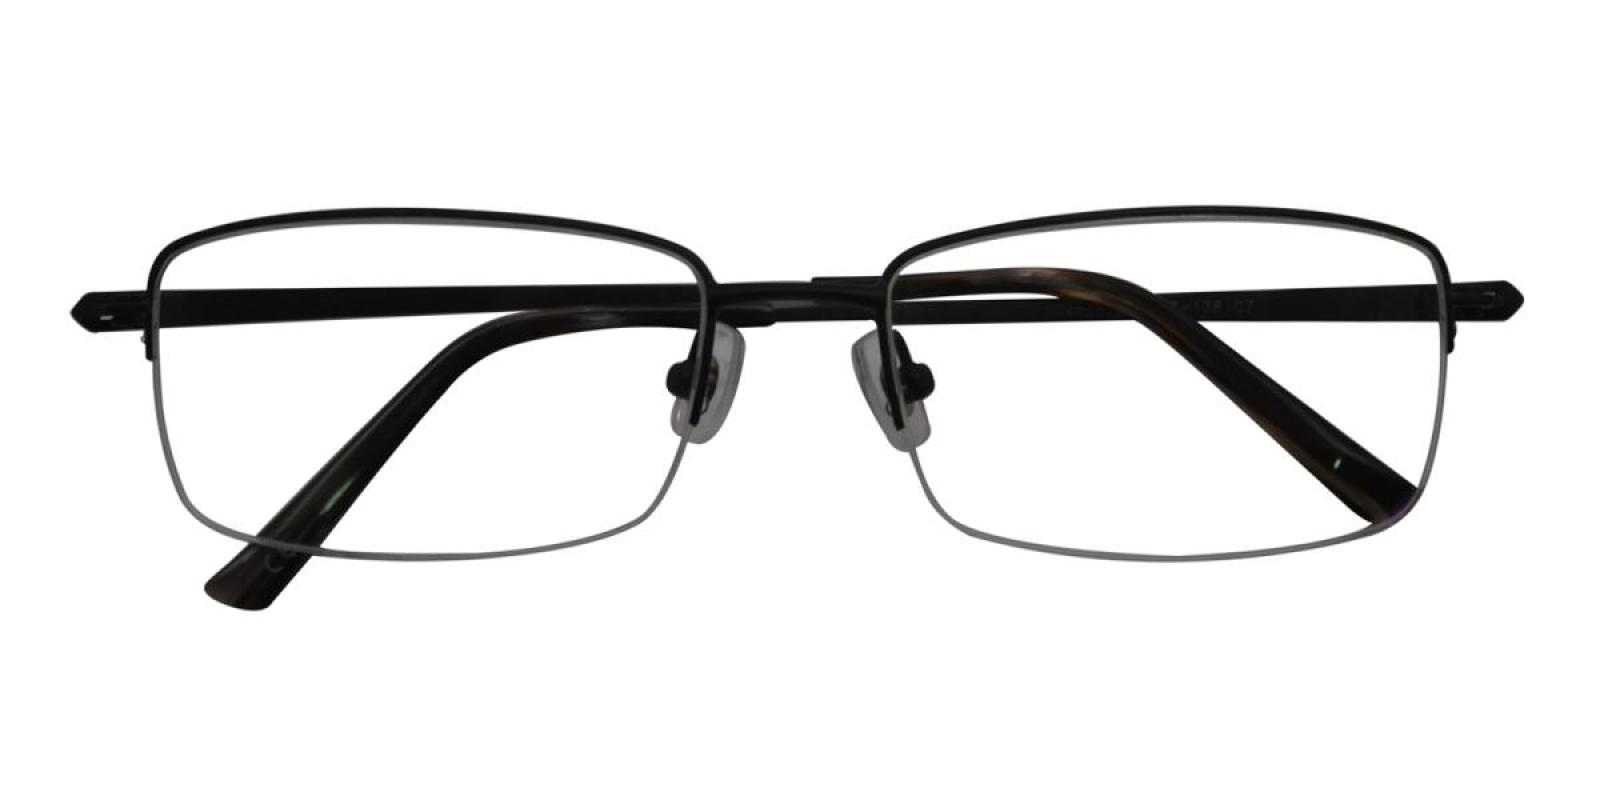 Oliv-Black-Rectangle-Titanium-Eyeglasses-detail